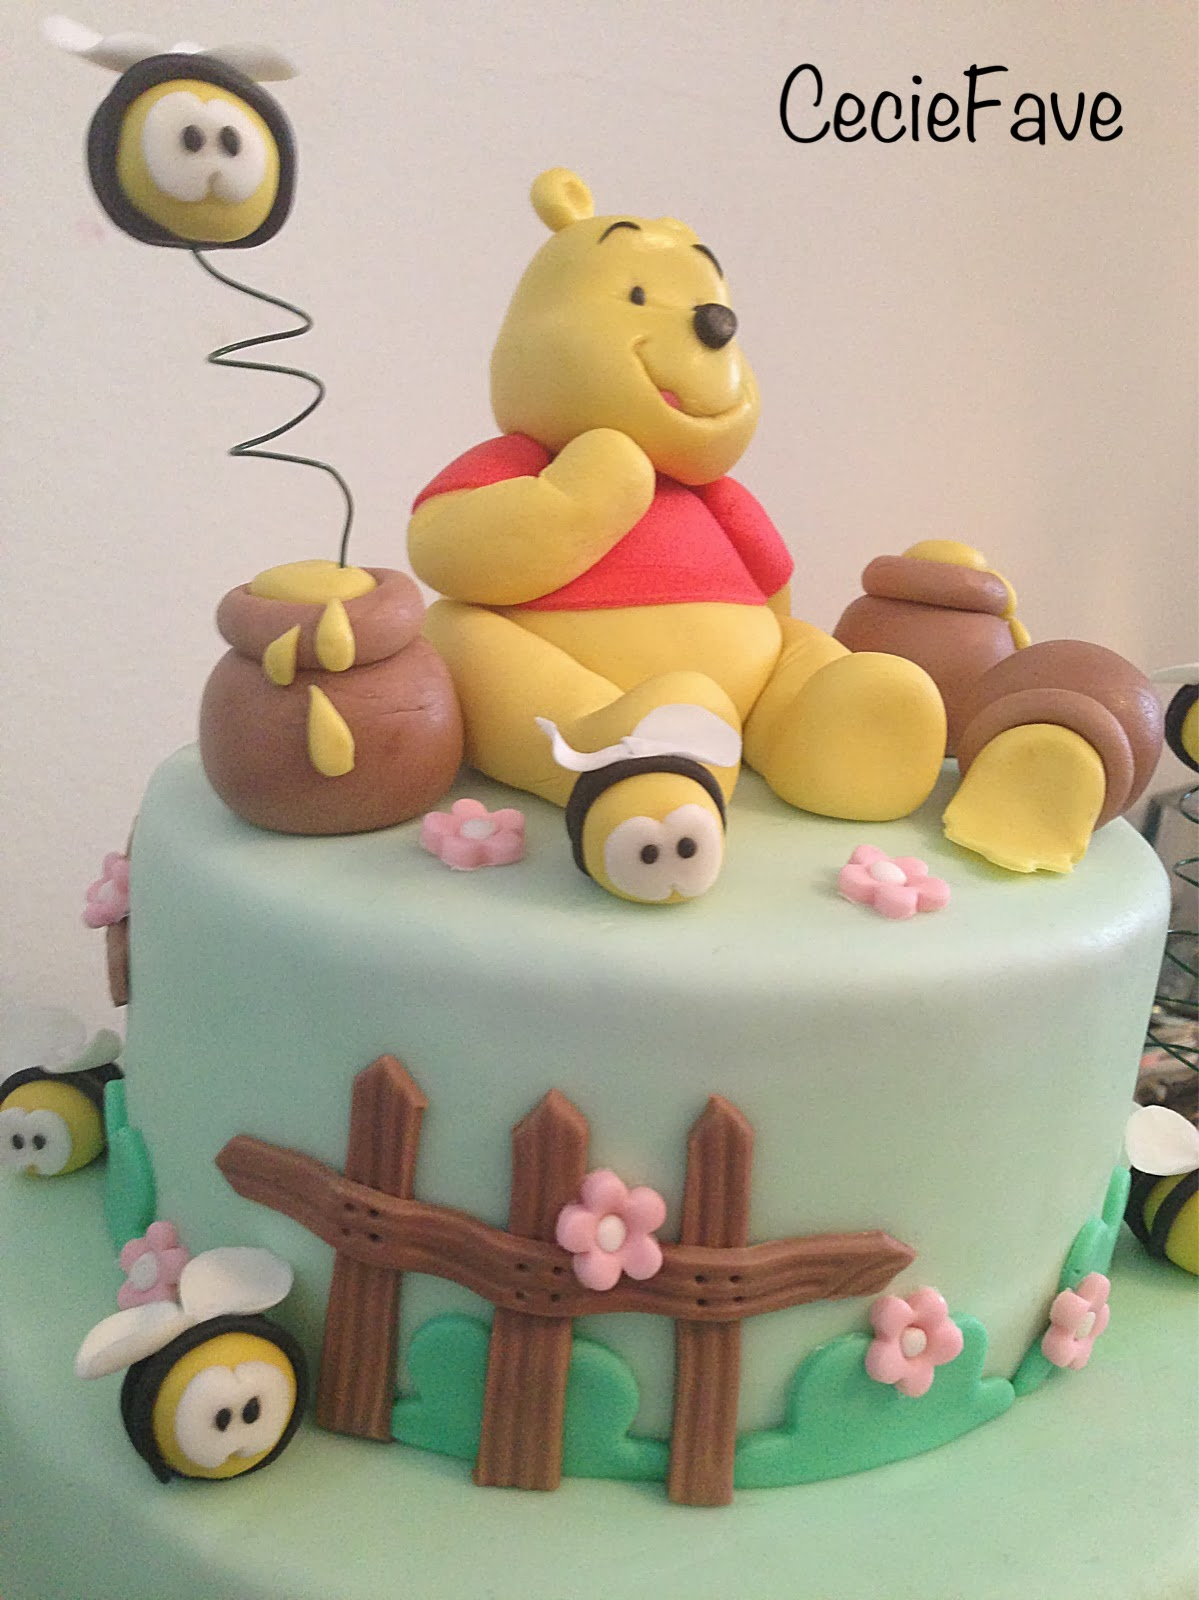 Ceciefave torta winnie pooh for Winnie pooh ka che